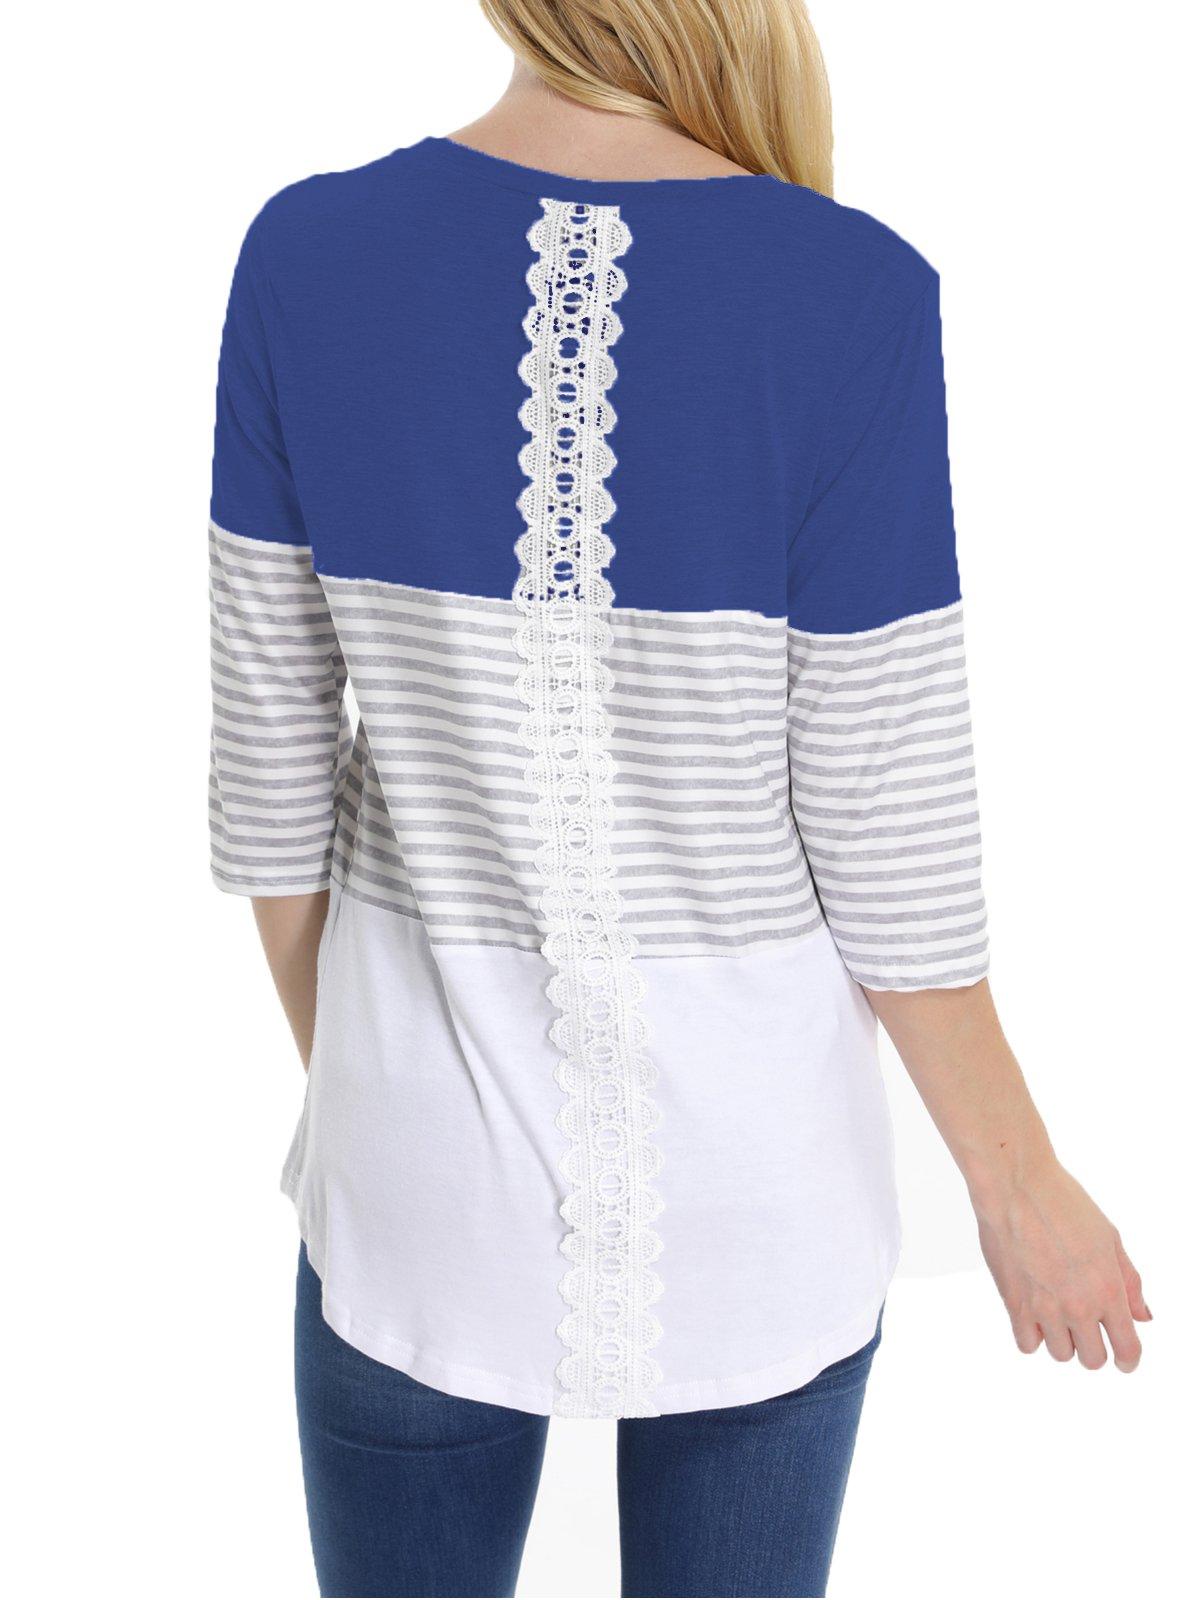 Vyncss Women's Three Quarter Sleeve Casual Tunic Tops Crew Neck Triple Color Block Stripe Blouse T-Shirt with Curved Hem (Dark Blue, Medium)